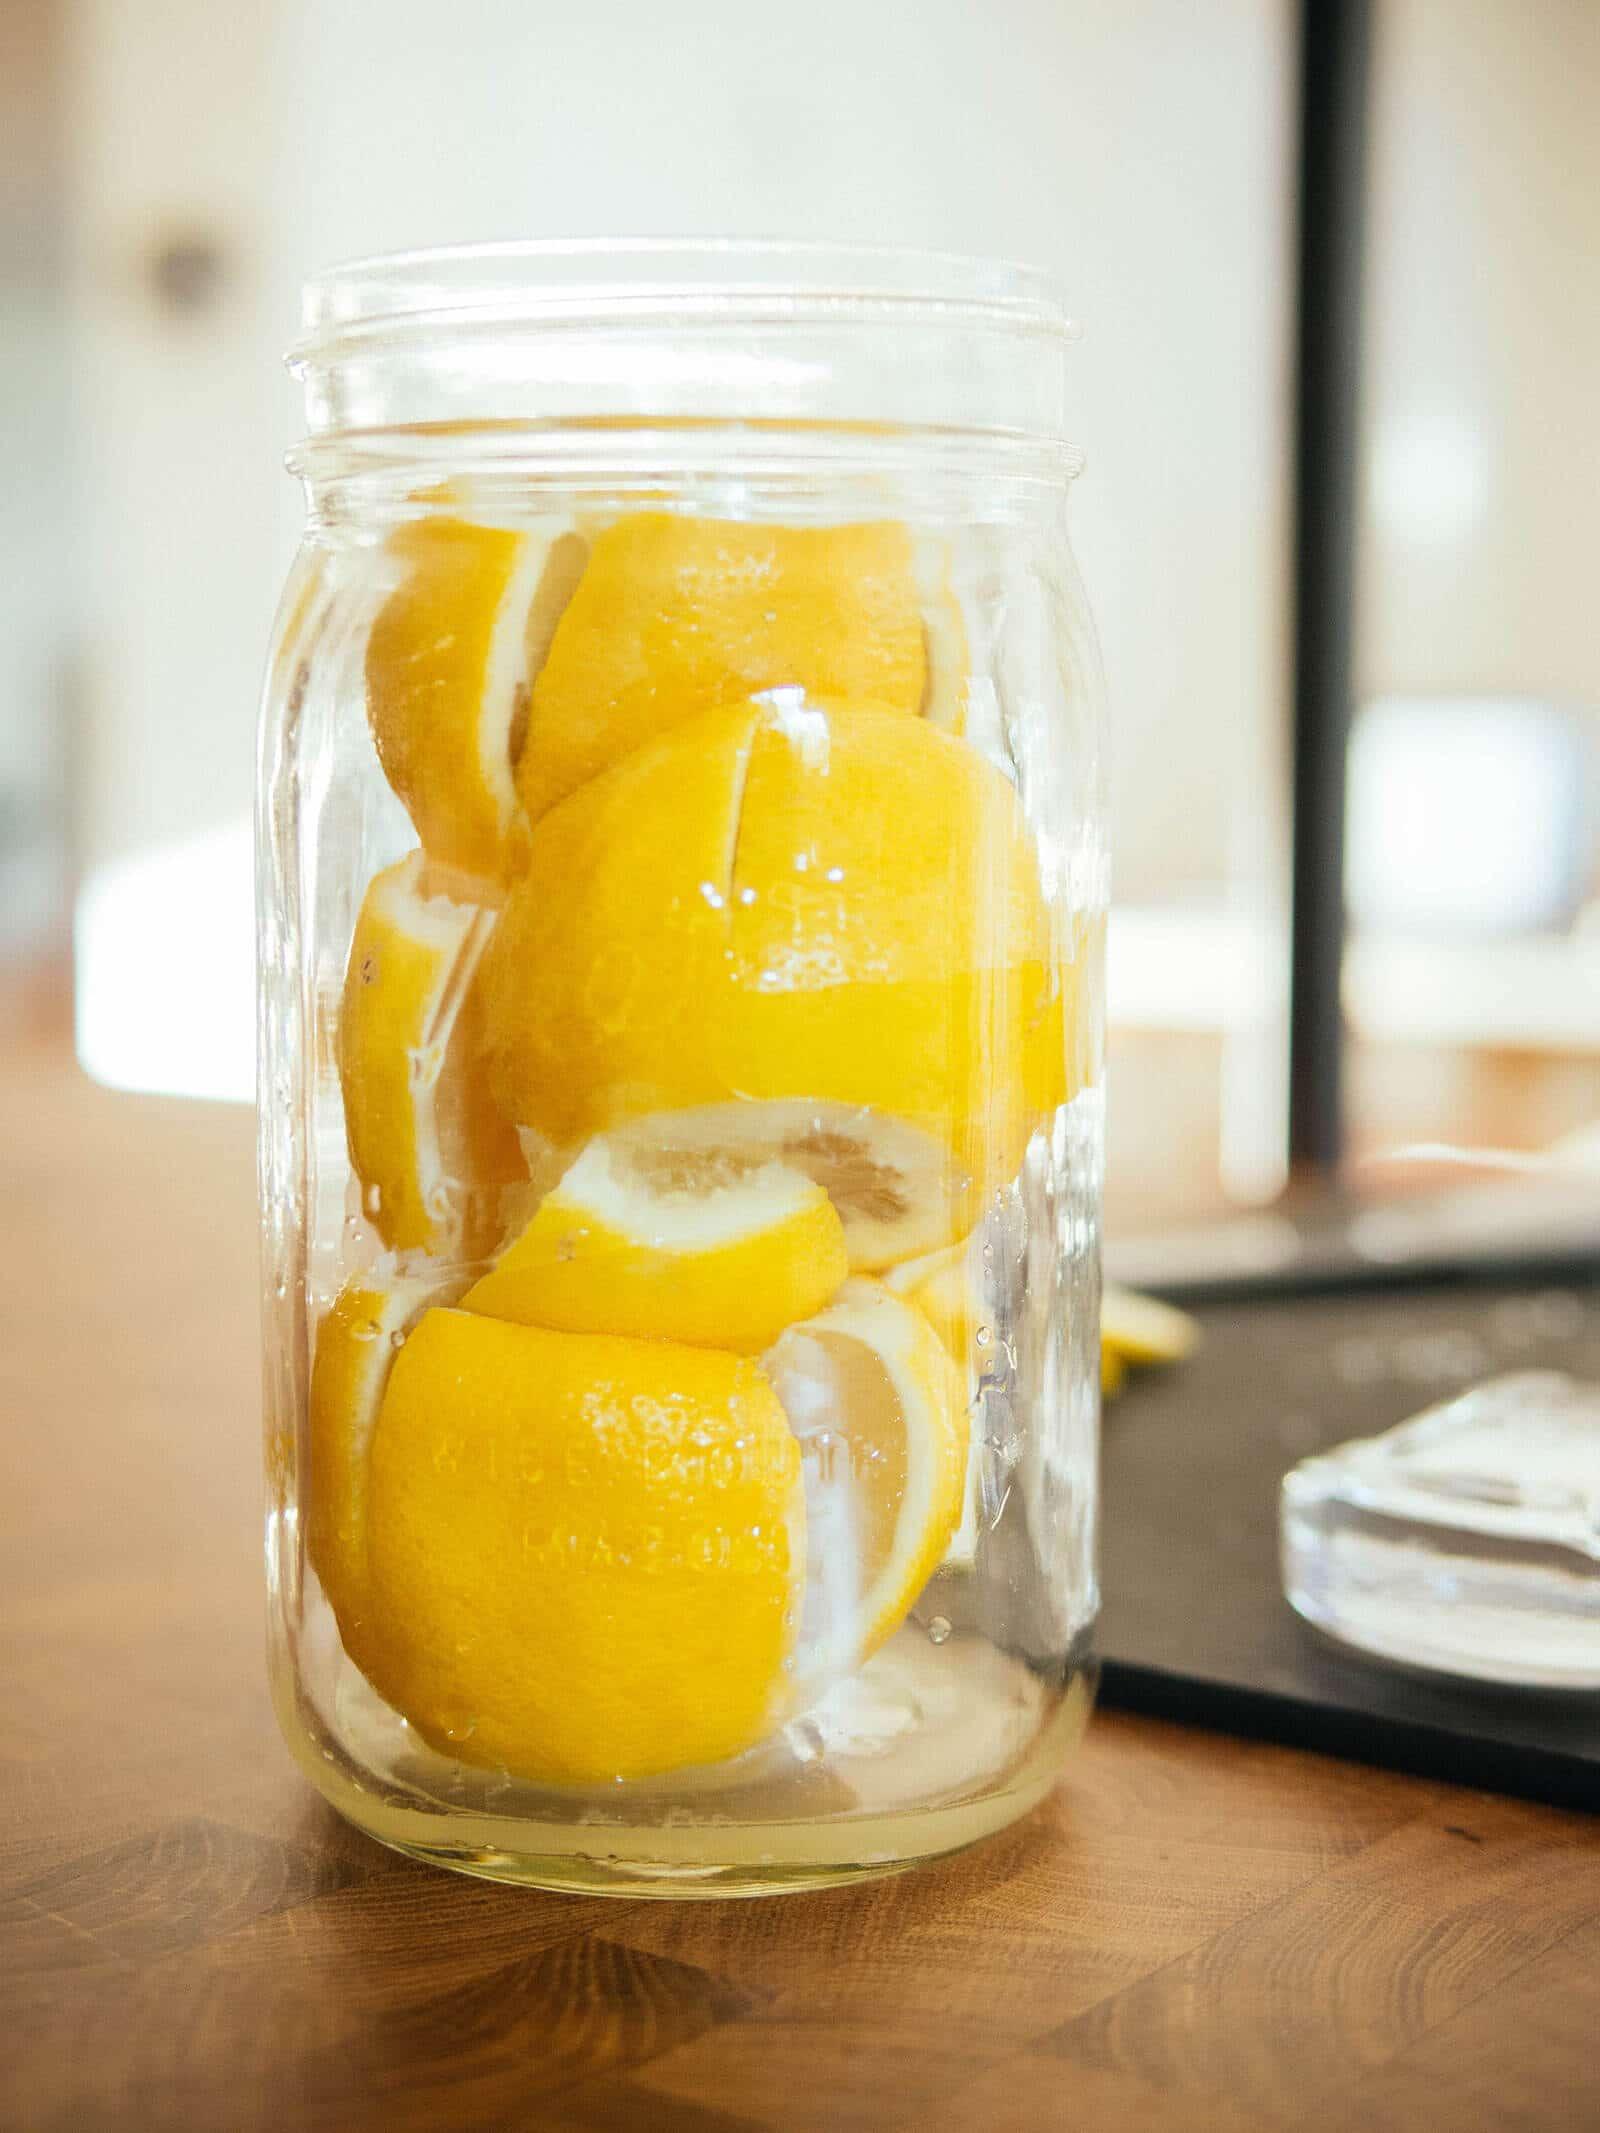 Salted lemons packed into an empty mason jar